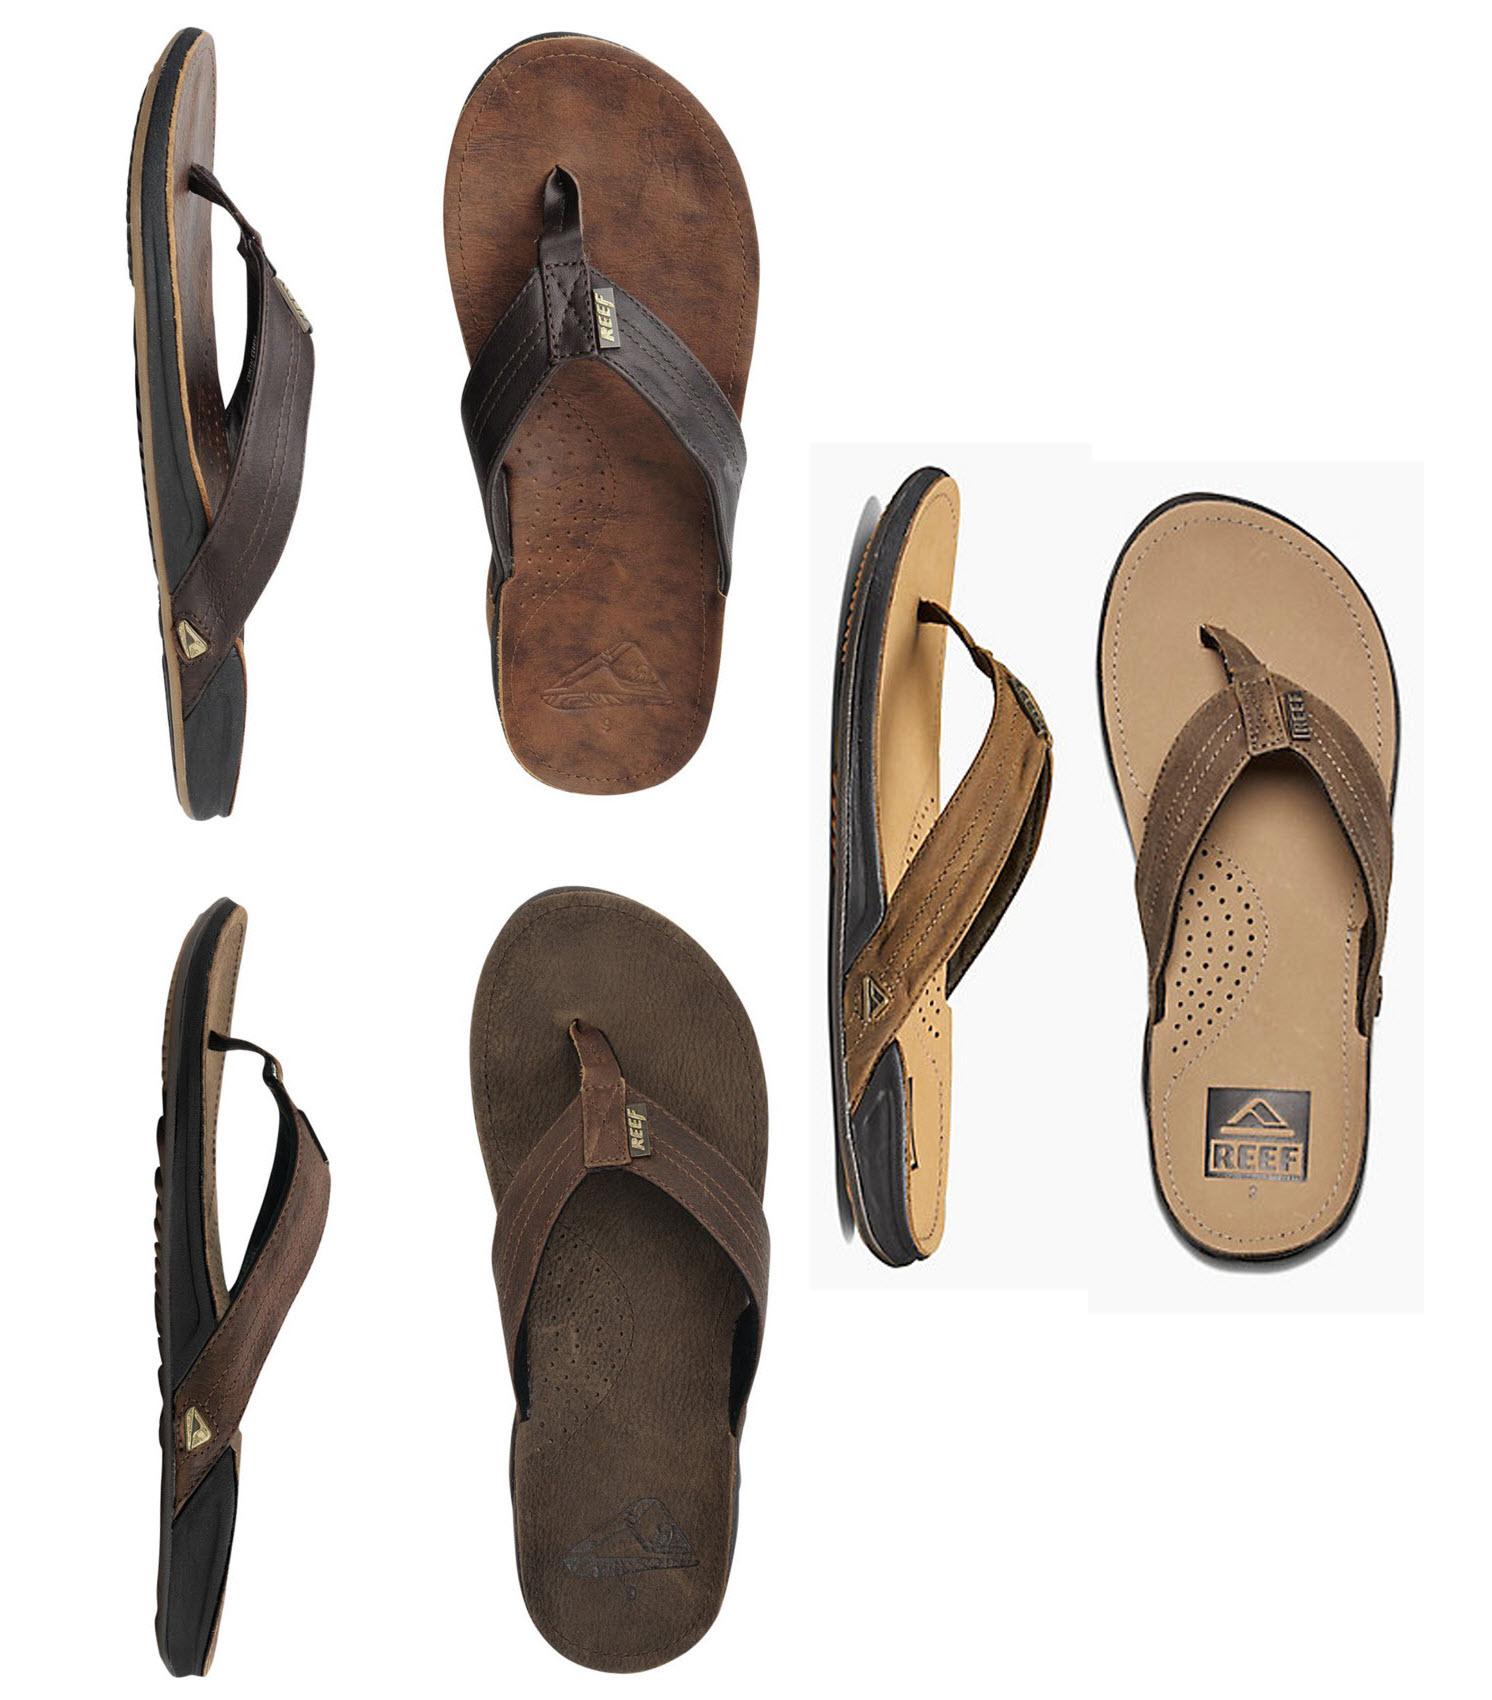 1a6e33602 Sentinel Reef Sandal - J-Bay Flip Flops - Dark Brown